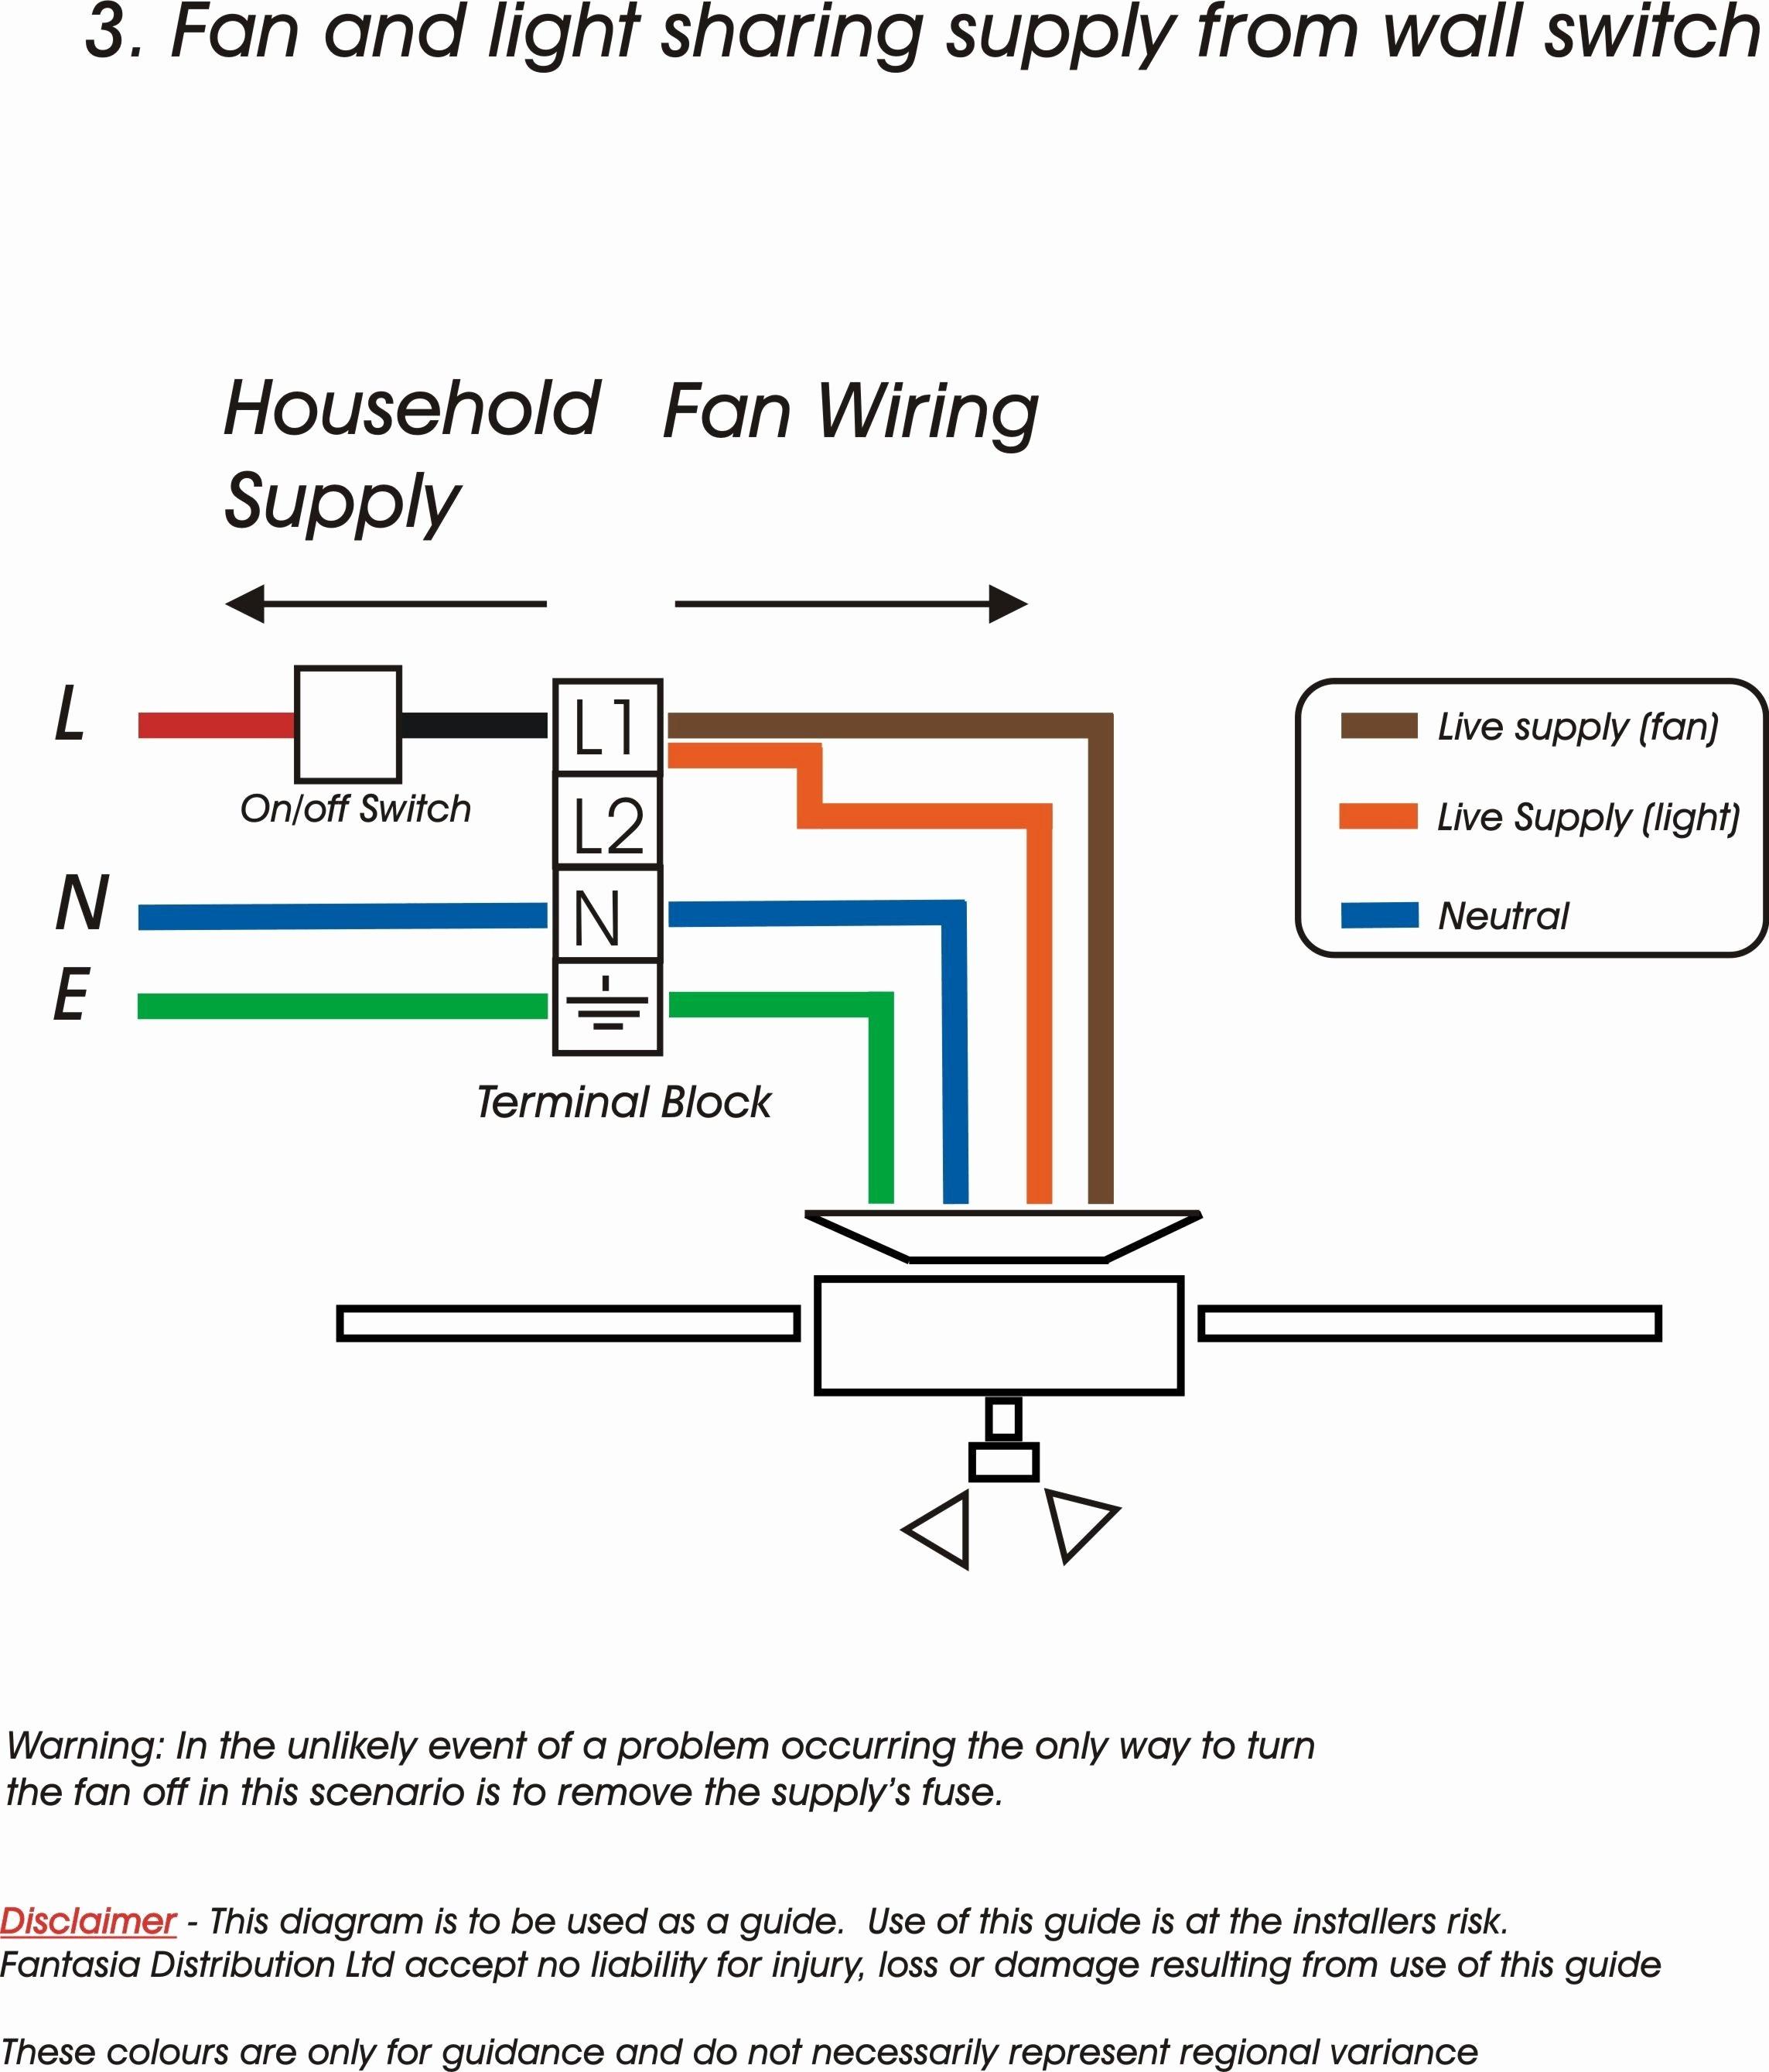 westinghouse ceiling fan wiring diagram - wiring diagram for westinghouse  ceiling fan refrence within 3s